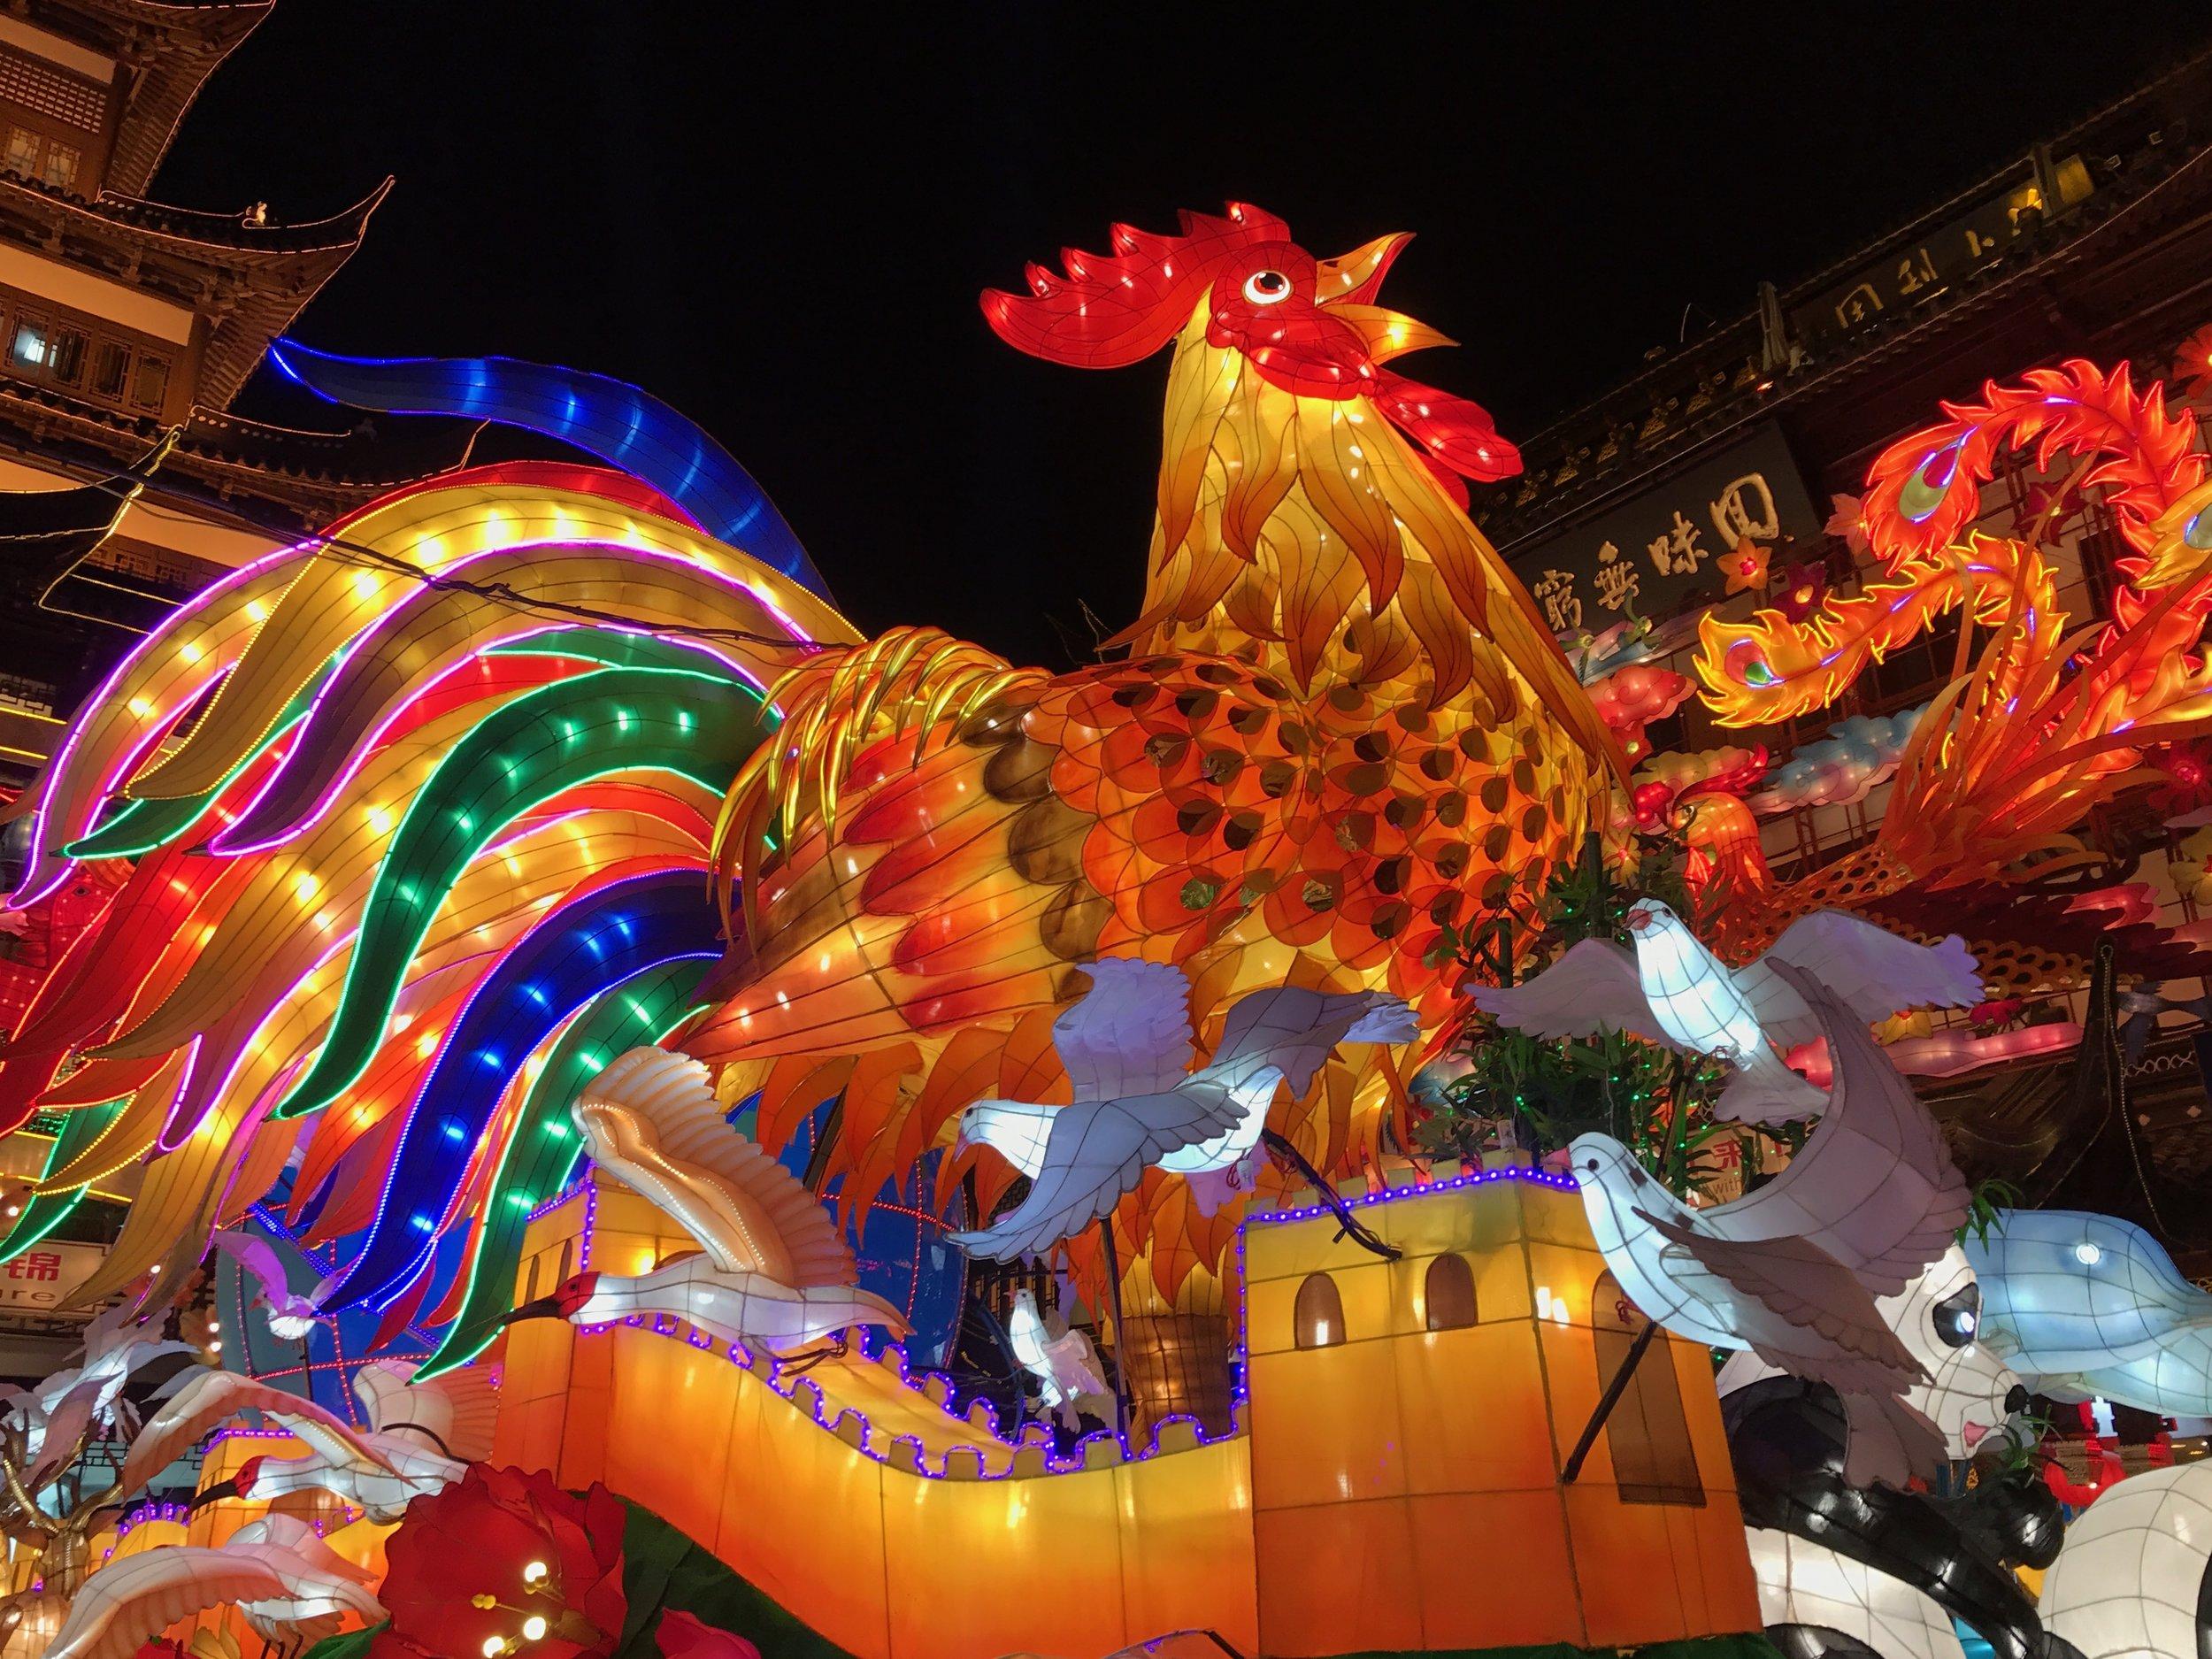 Lantern Festival in the Yu Gardens 豫園 in Shanghai. Source: Kevin Hsu